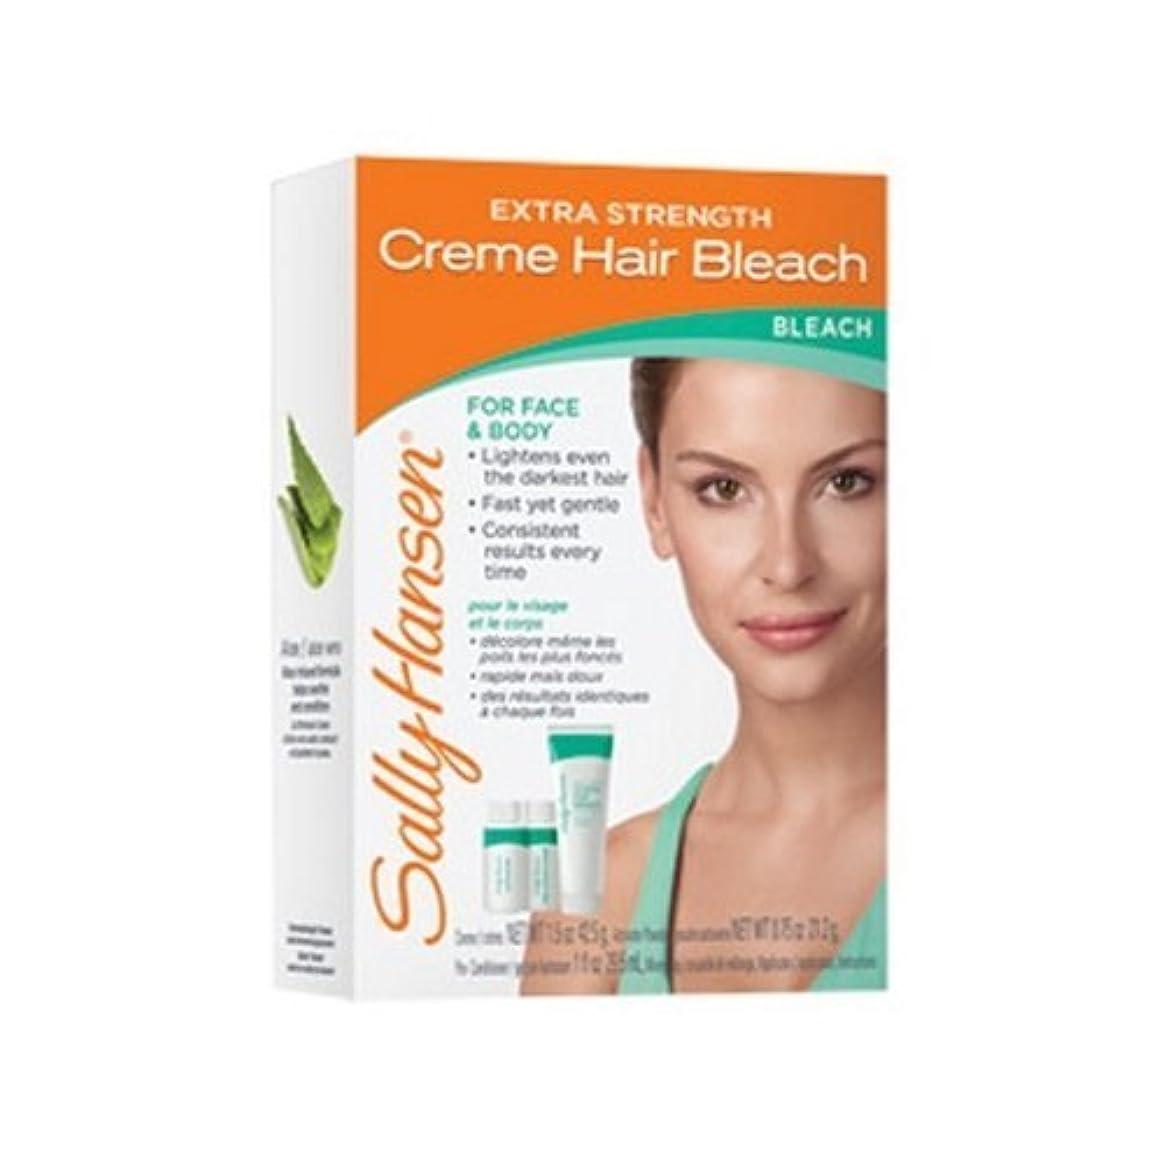 理容室腰年次(3 Pack) SALLY HANSEN Extra Strength Creme Hair Bleach for Face & Body - SH2010 (並行輸入品)